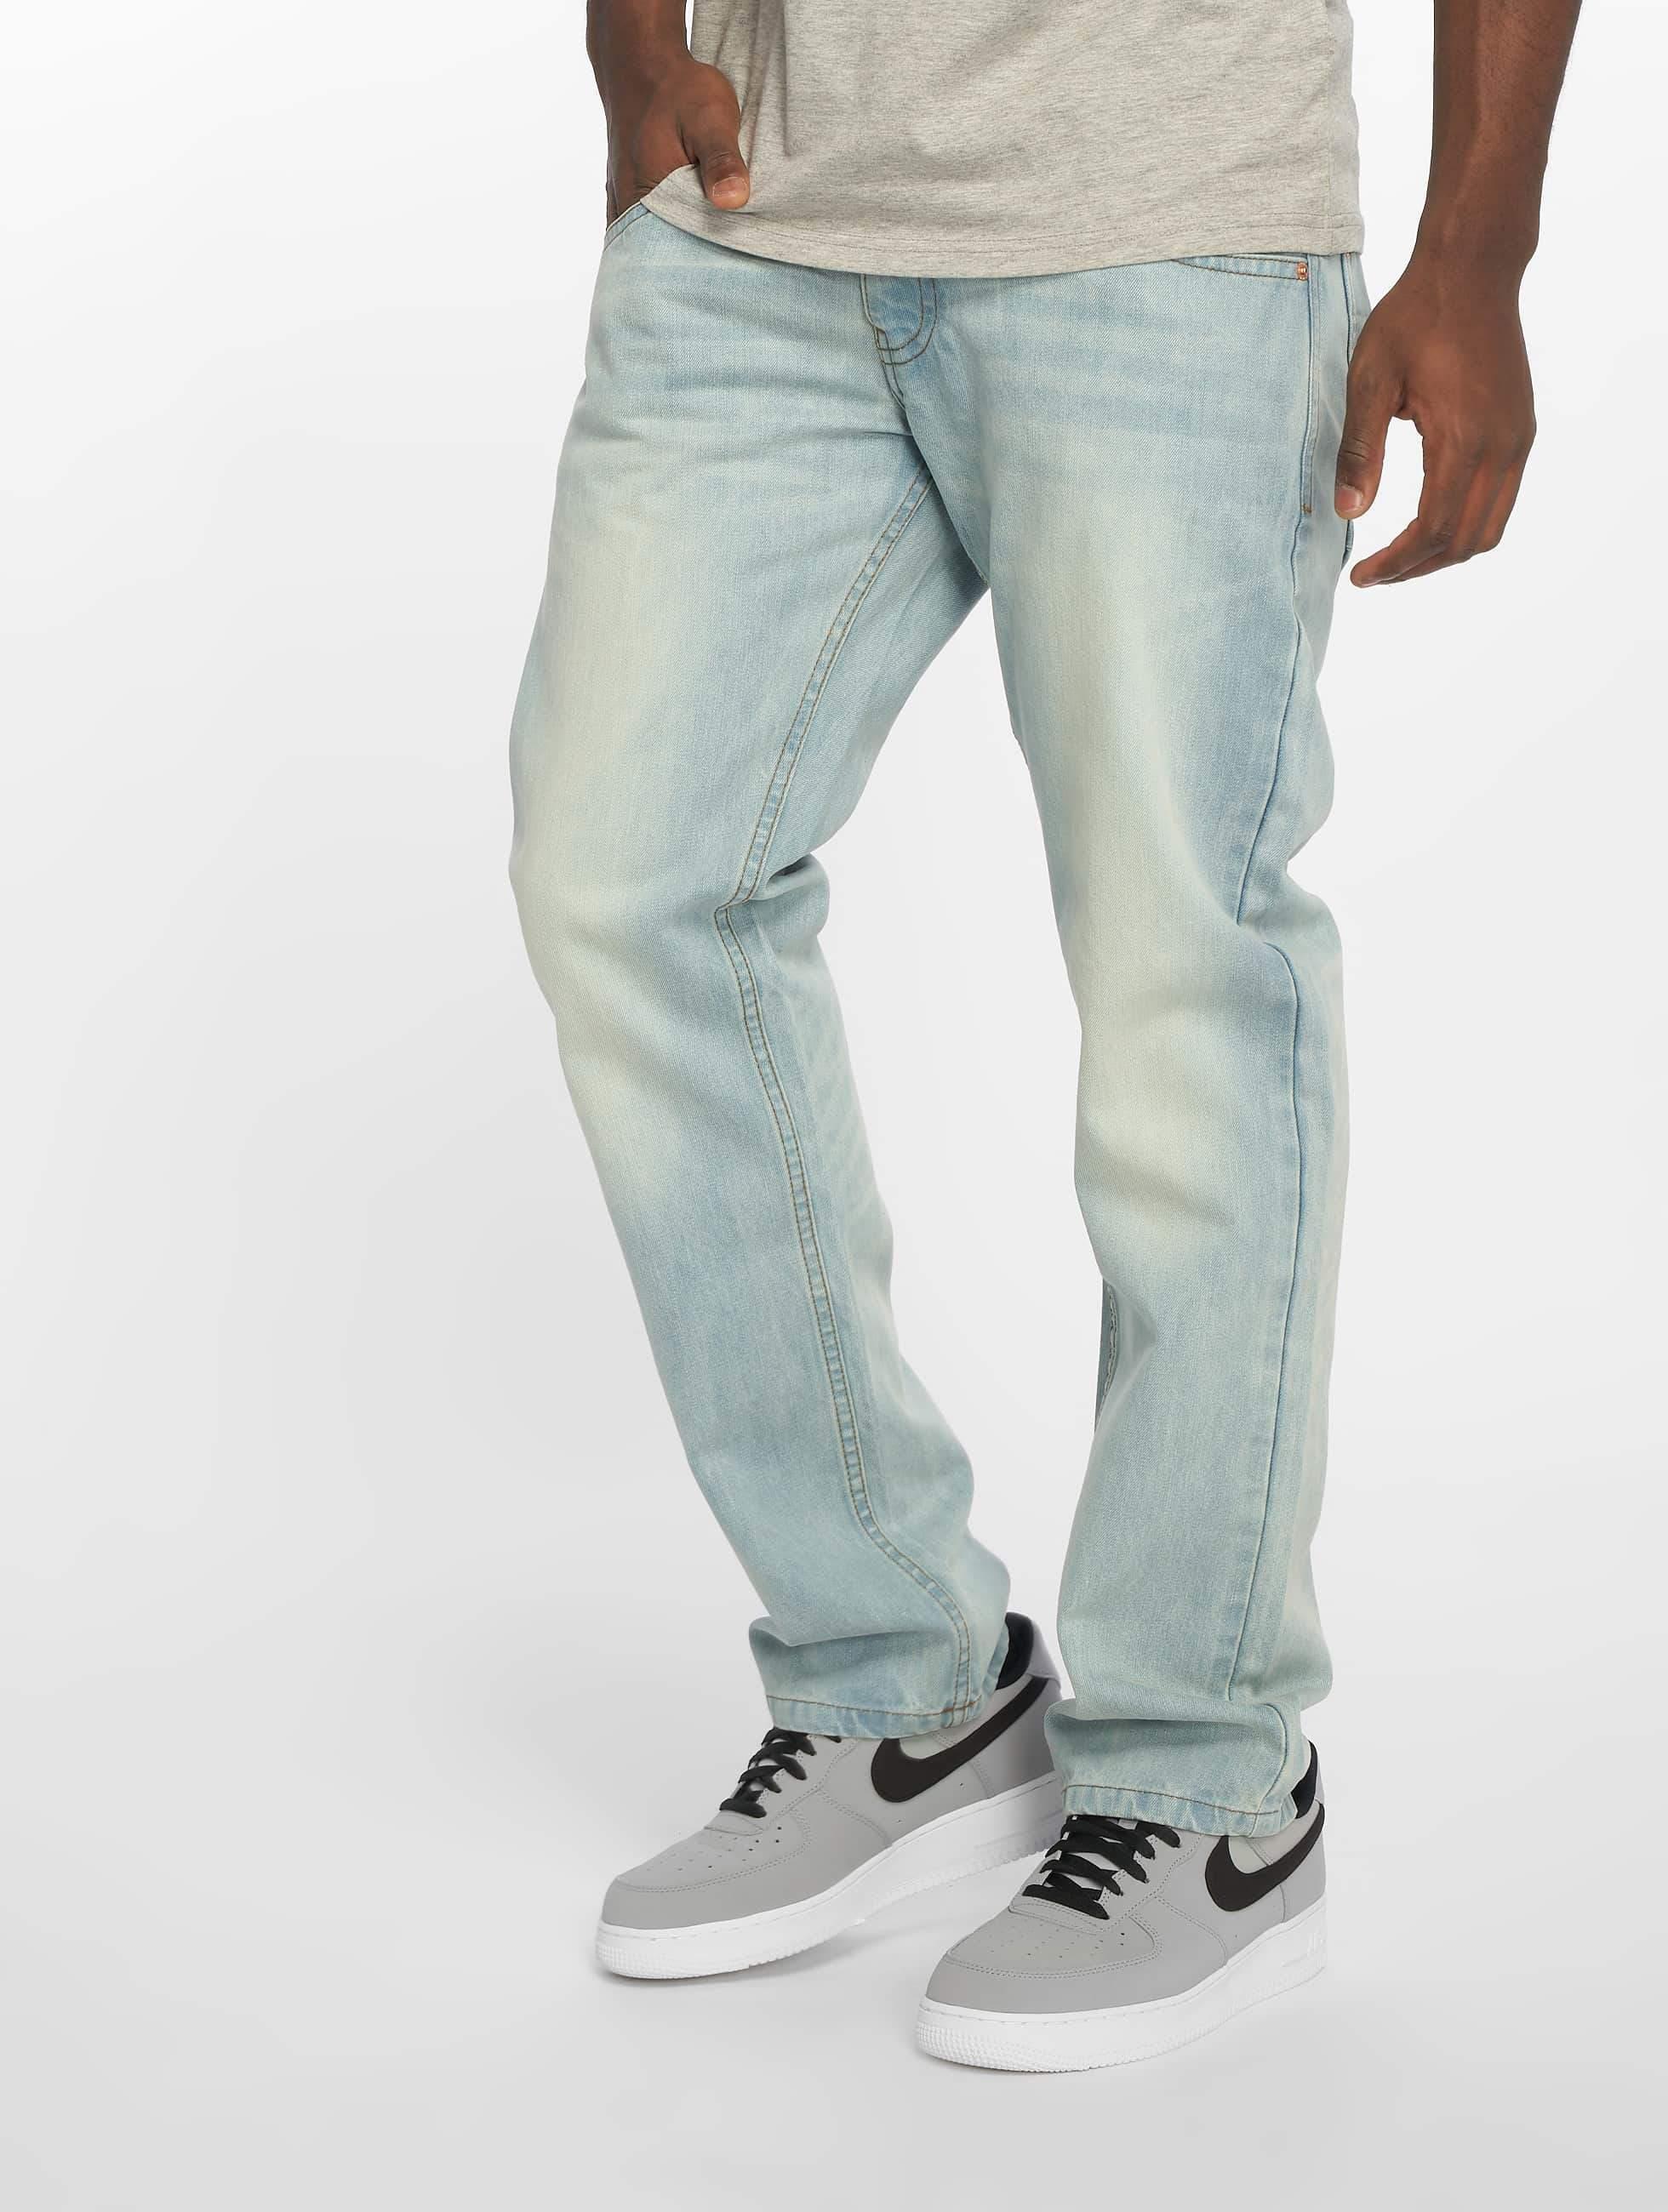 Rocawear / Straight Fit Jeans MON Tony in blue W 44 L 34